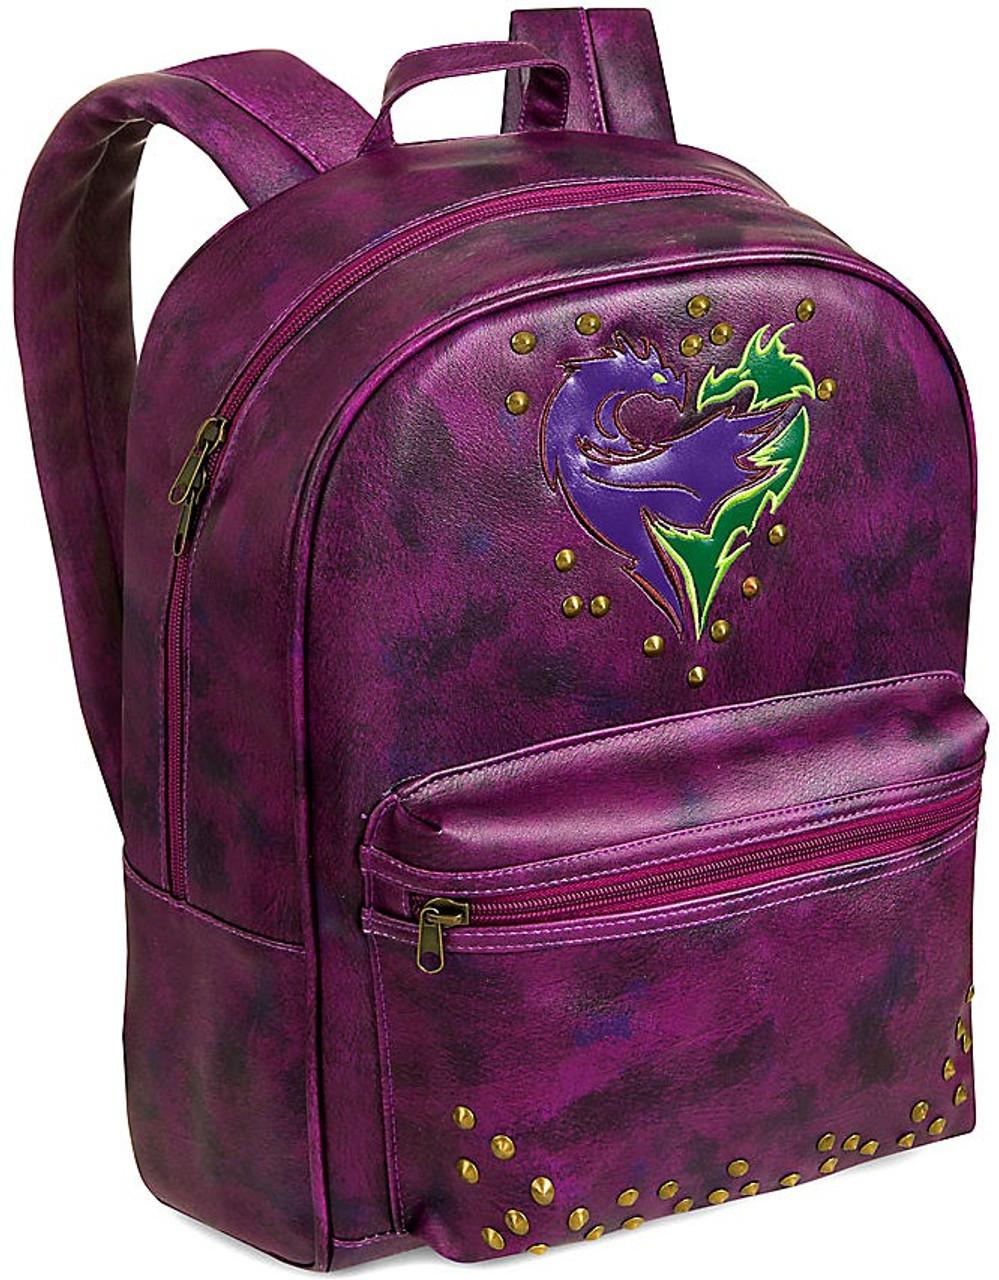 825c7ee852 Disney Descendants Descendants 2 Backpack - ToyWiz